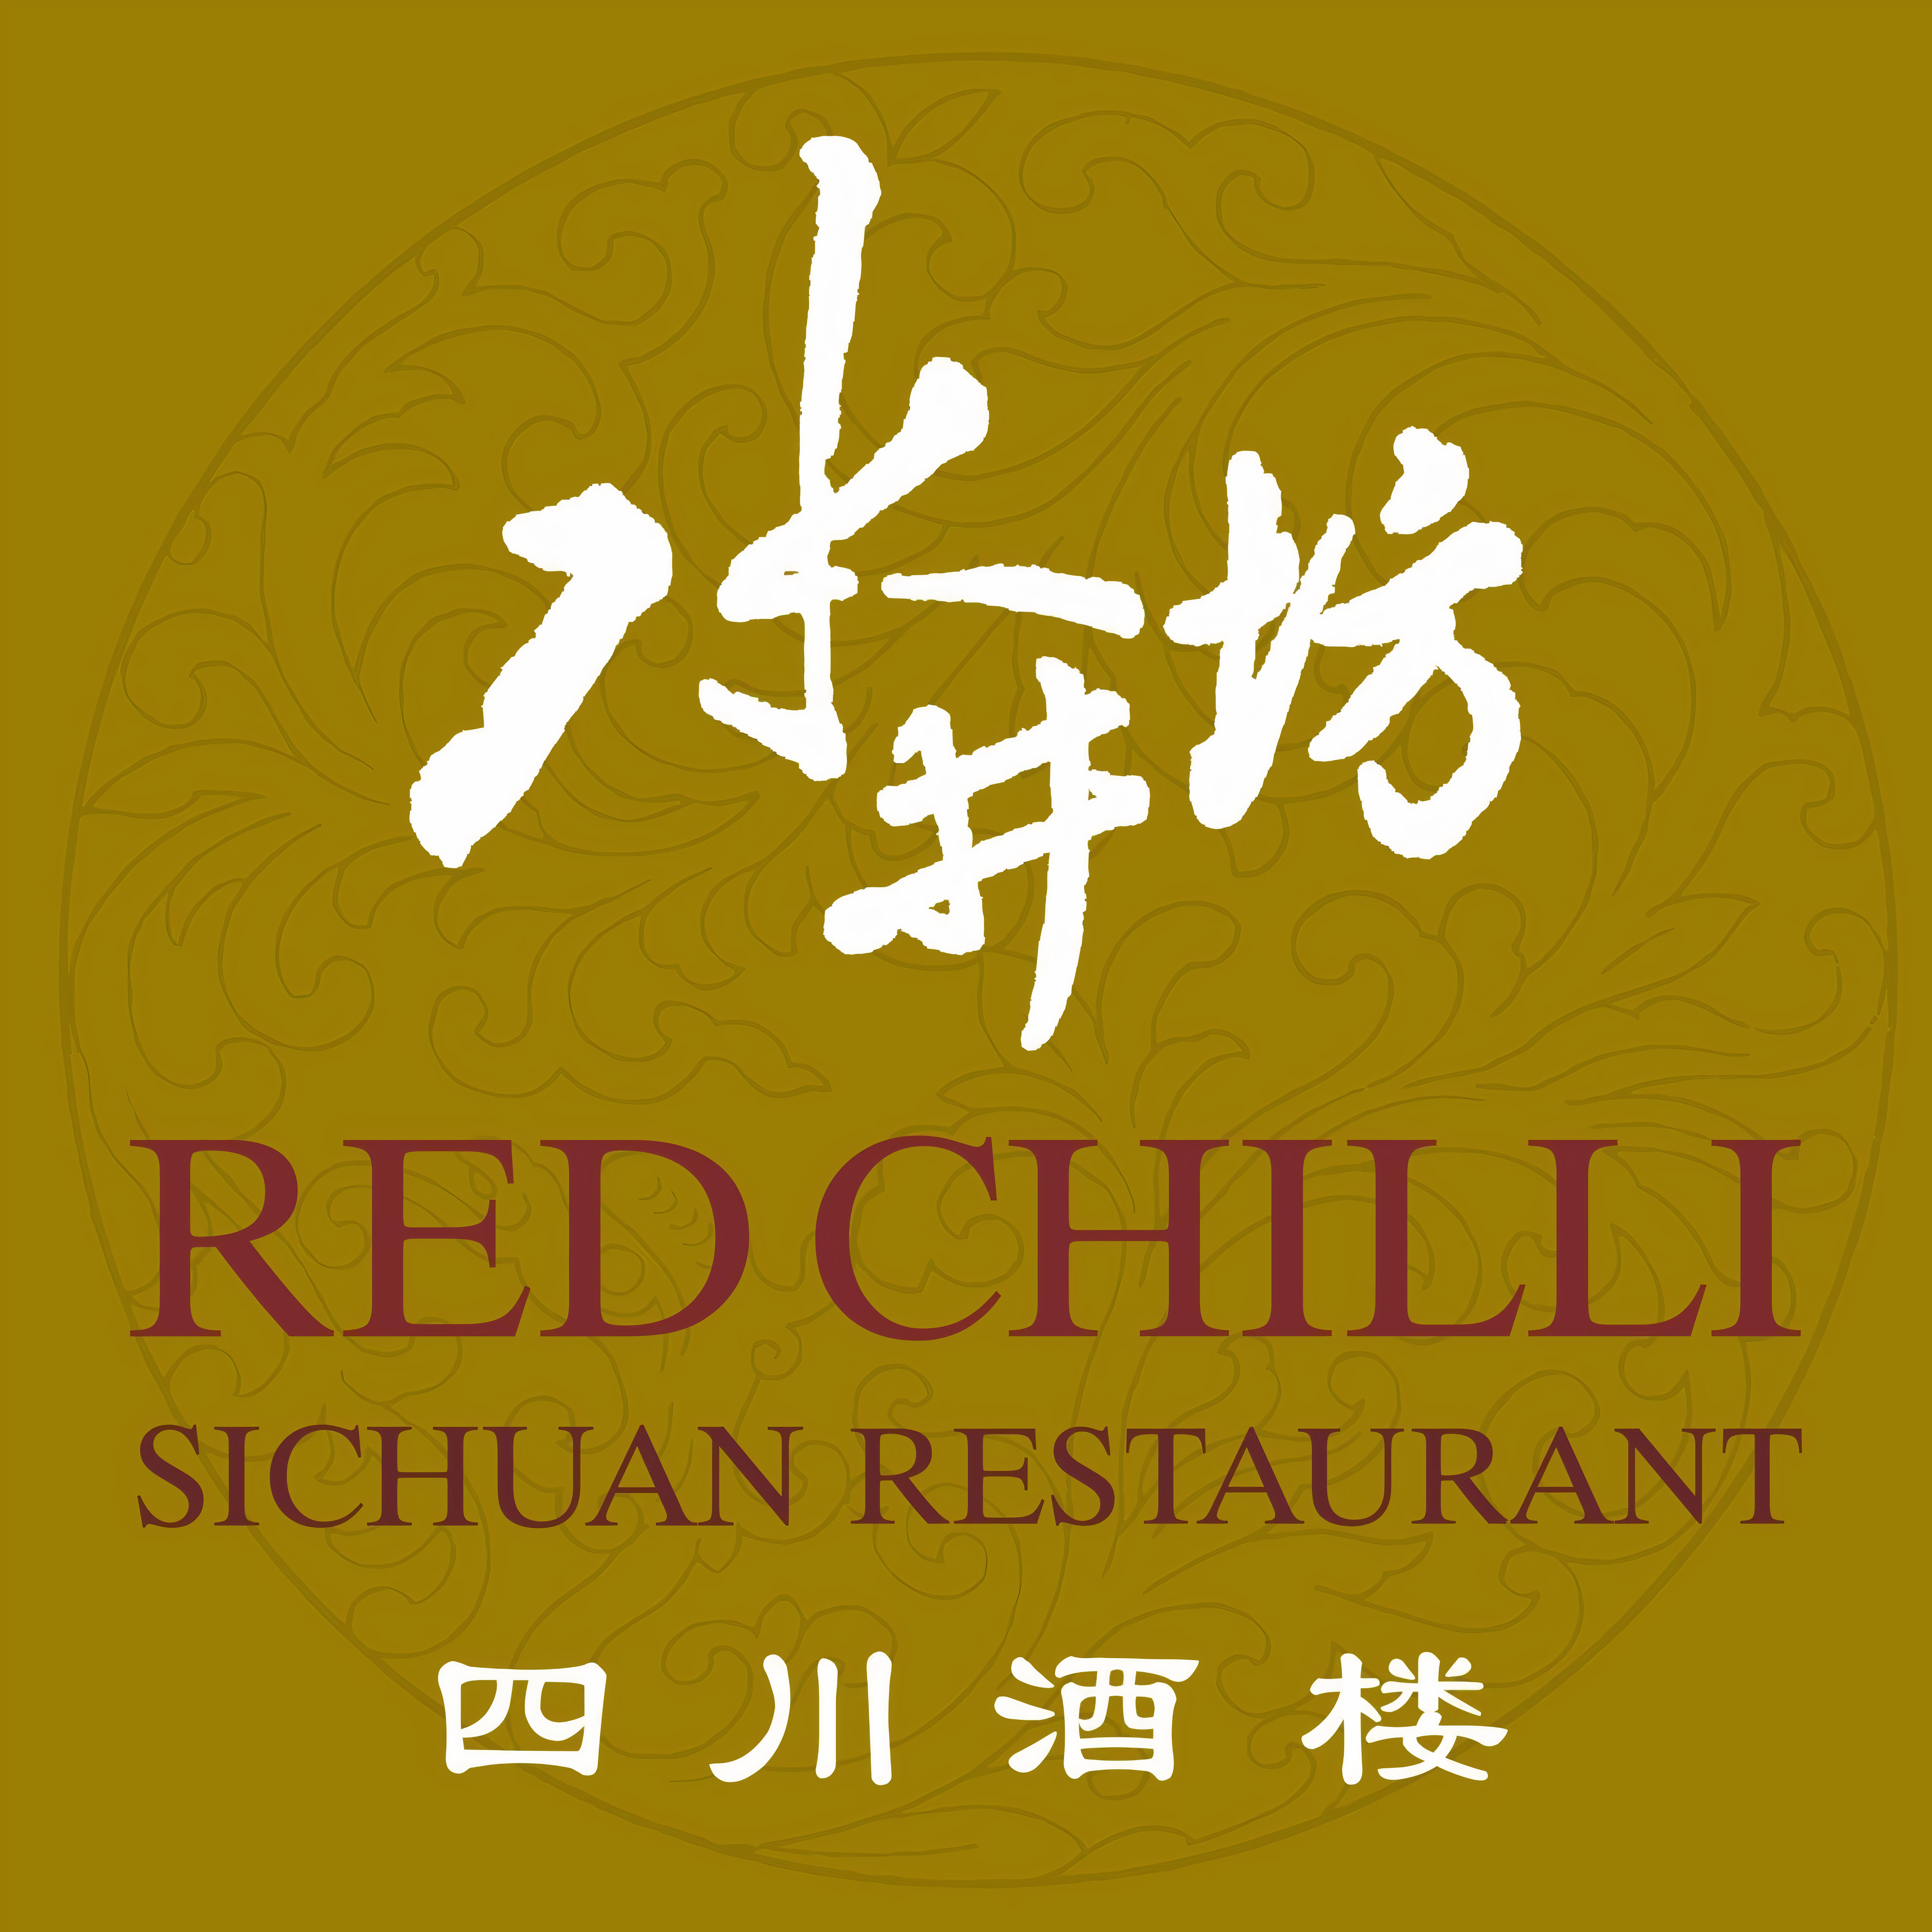 $35 Cash Voucher at Red Chilli Sichuan Restaurant - Get Deals, Cashback and Rewards with ShopBack GO